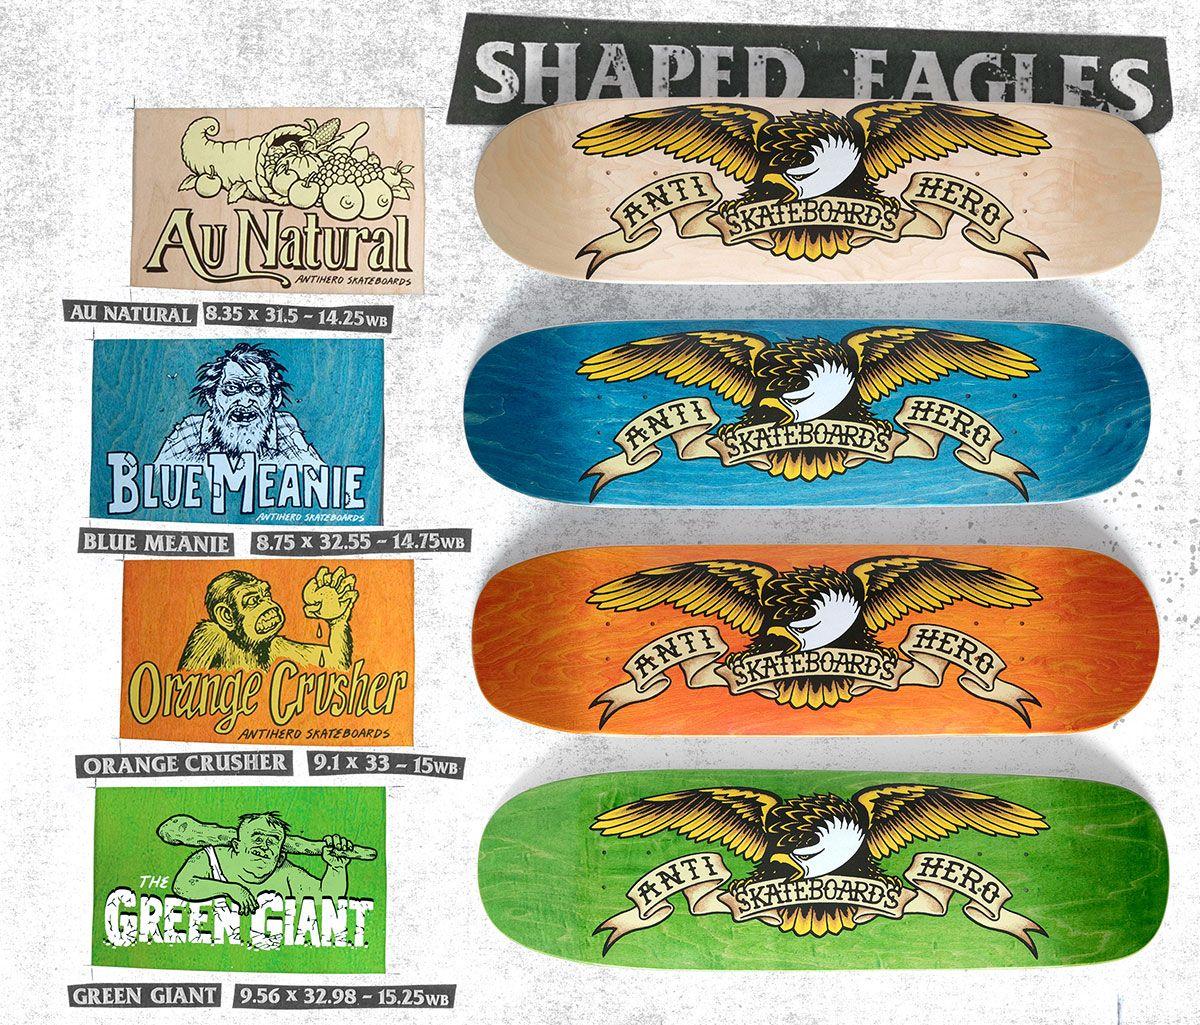 e26460ac1d Anti Hero Shaped Eagles!!! | One Eight | Anti hero skateboards, Hero ...